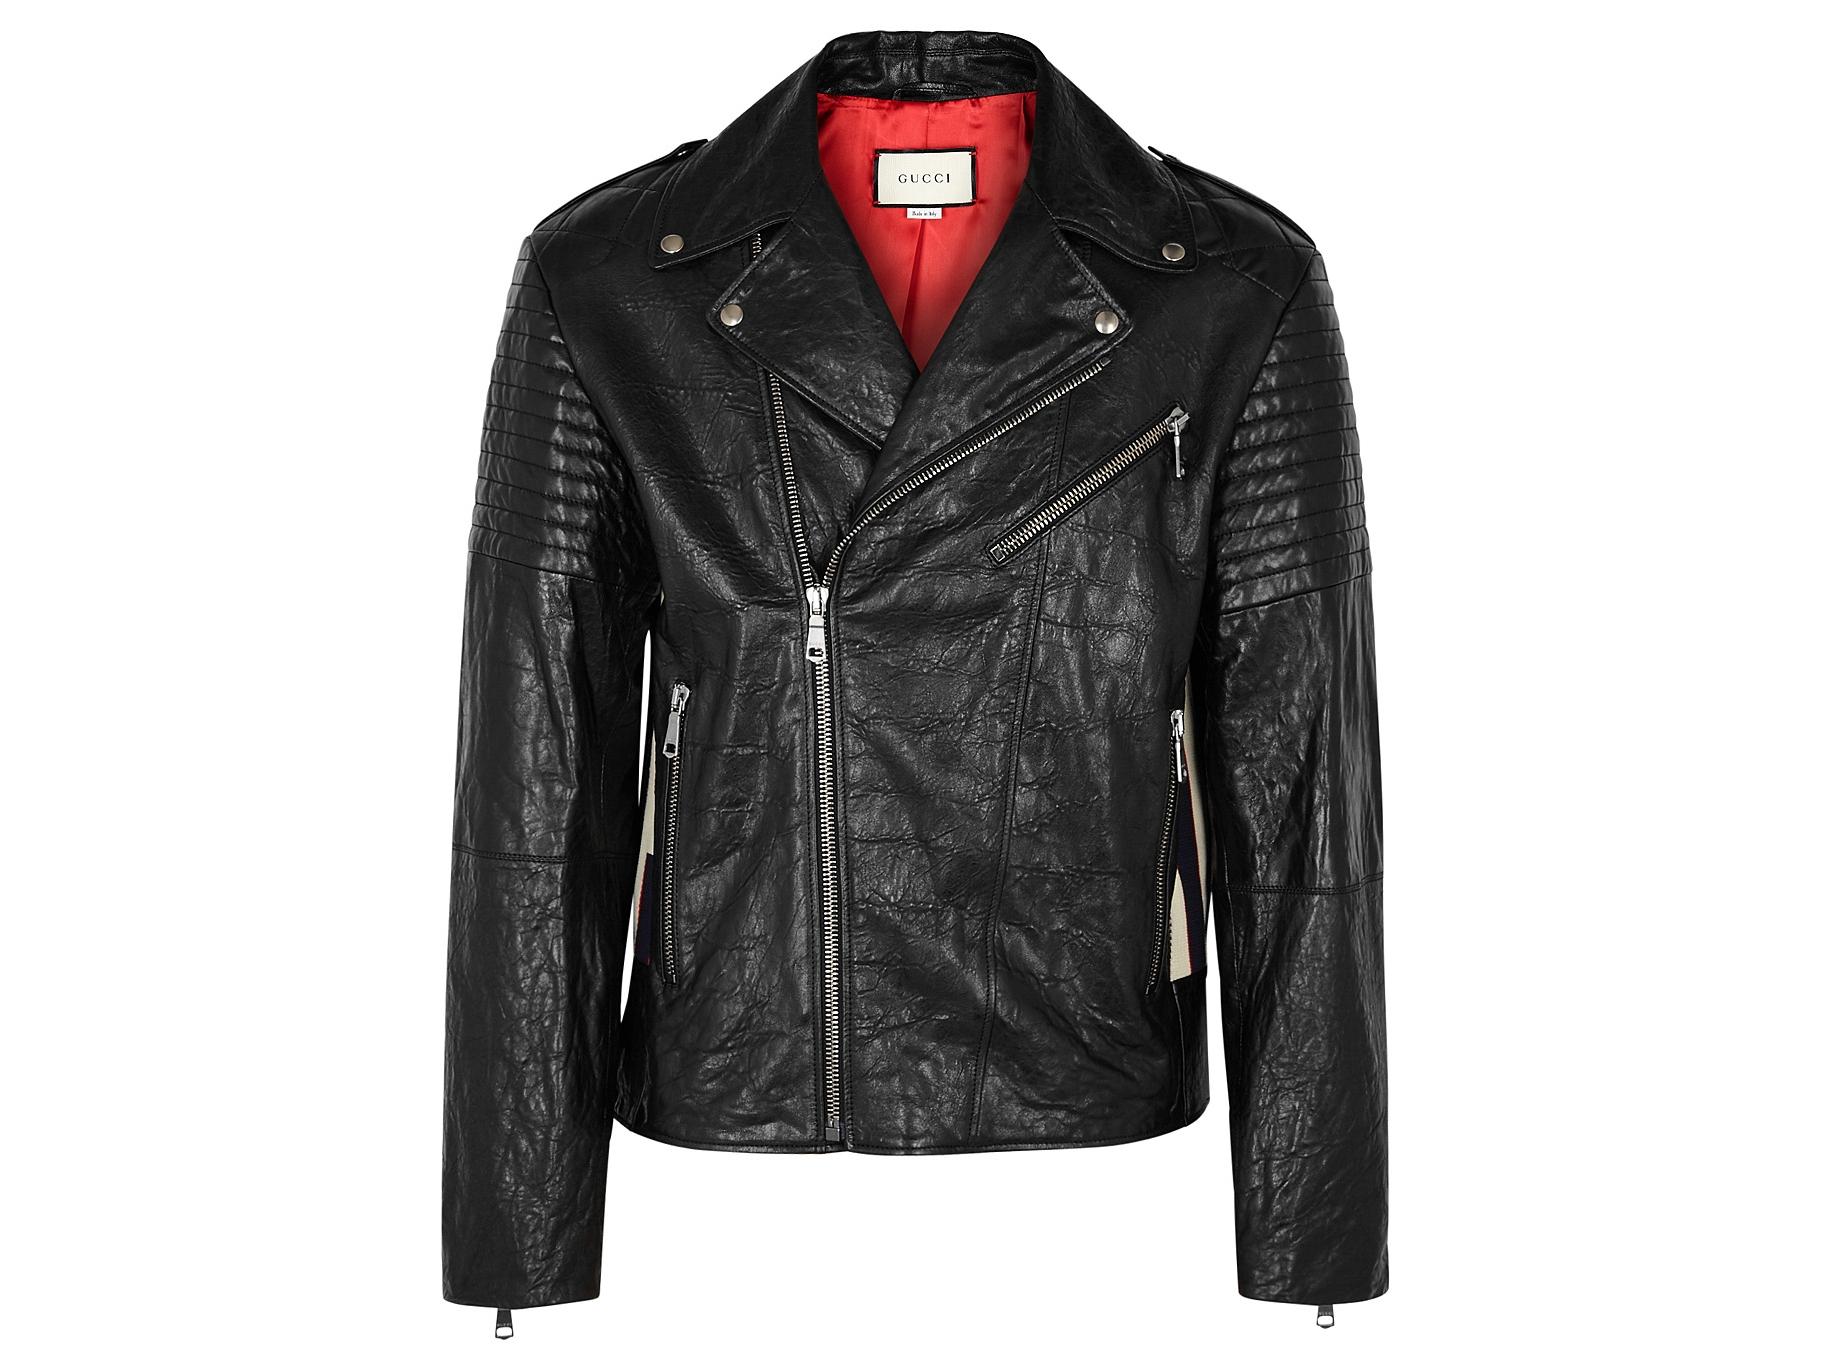 a74355658cfa Gucci Black leather biker jacket - Harvey Nichols